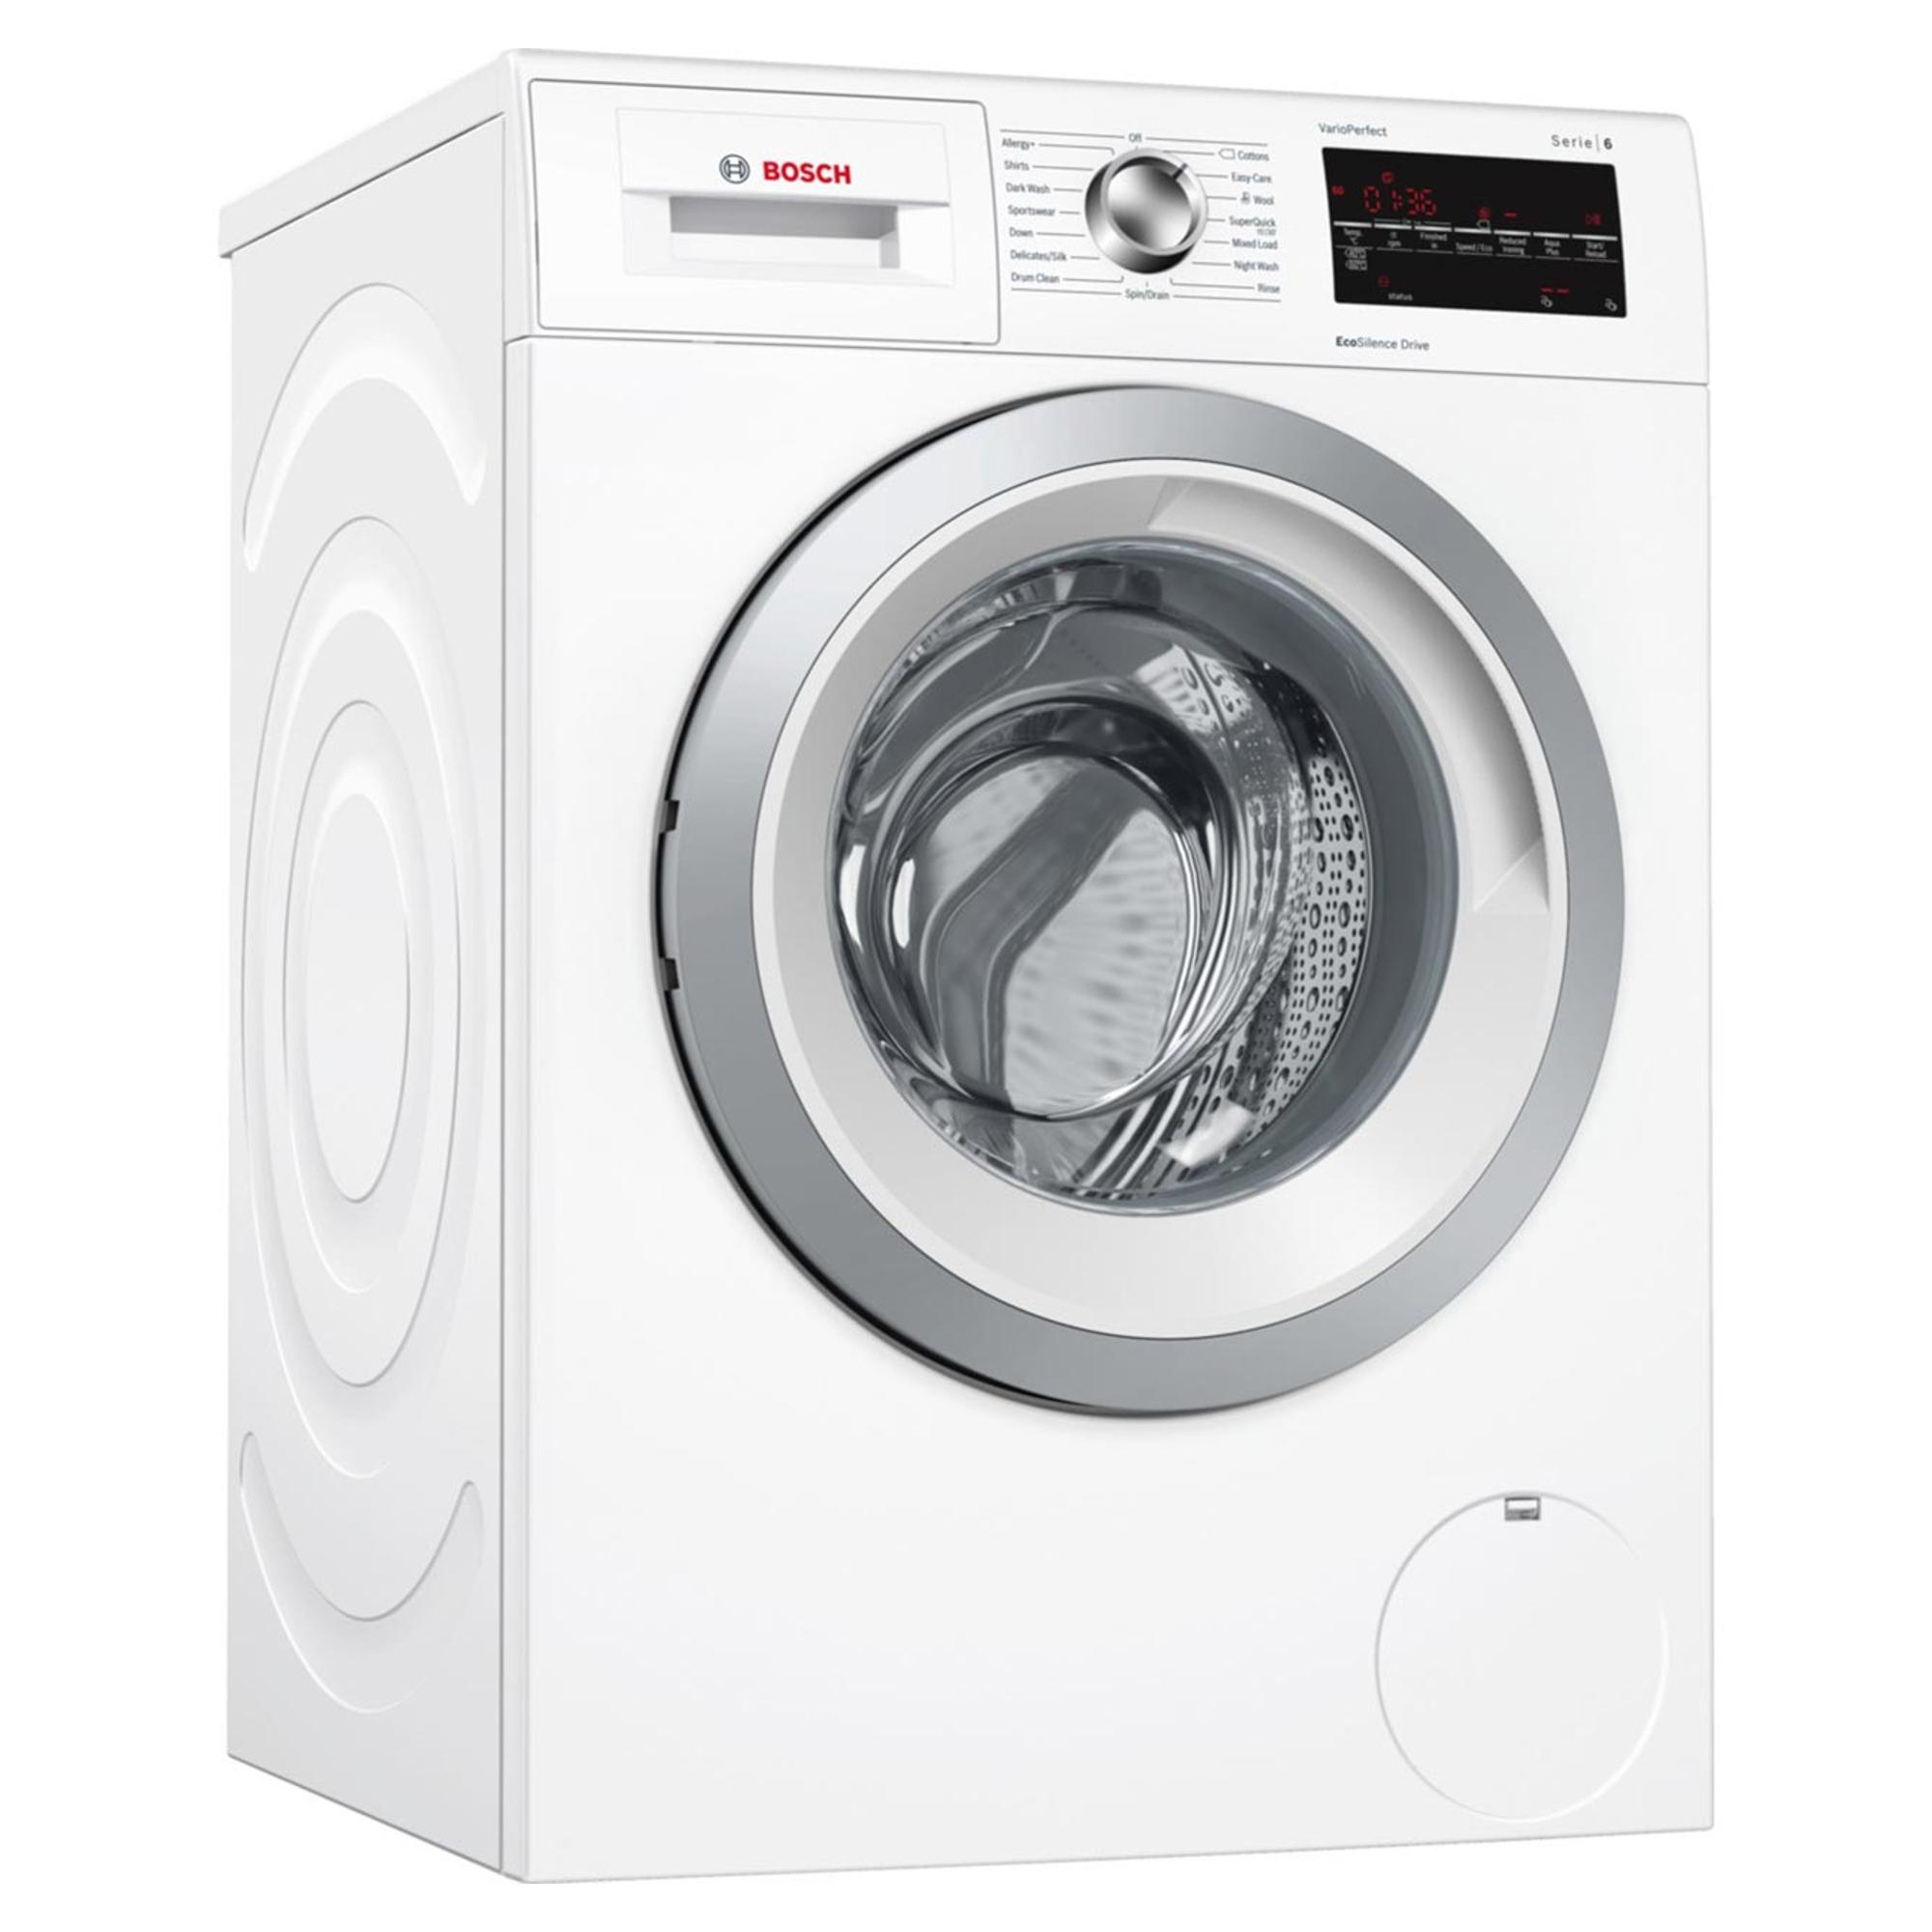 Bosch WAT GB 9KG Load Capacity 1200rpm Spin Speed Washing